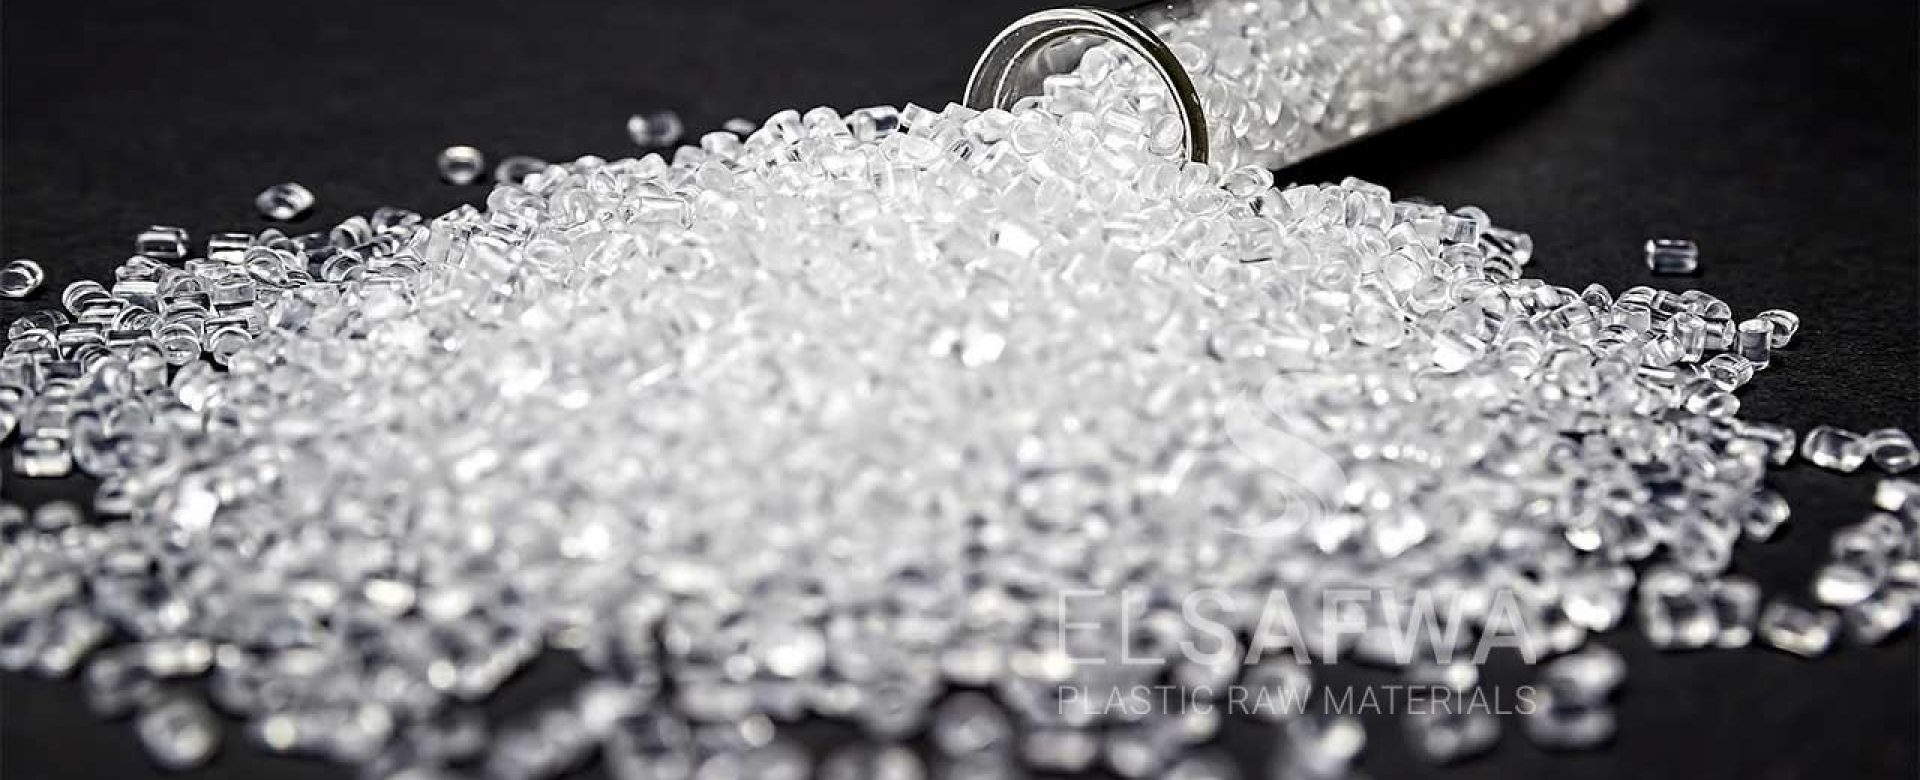 El-safwa-trade-plastic-trading-raw-materials-recycled-pet